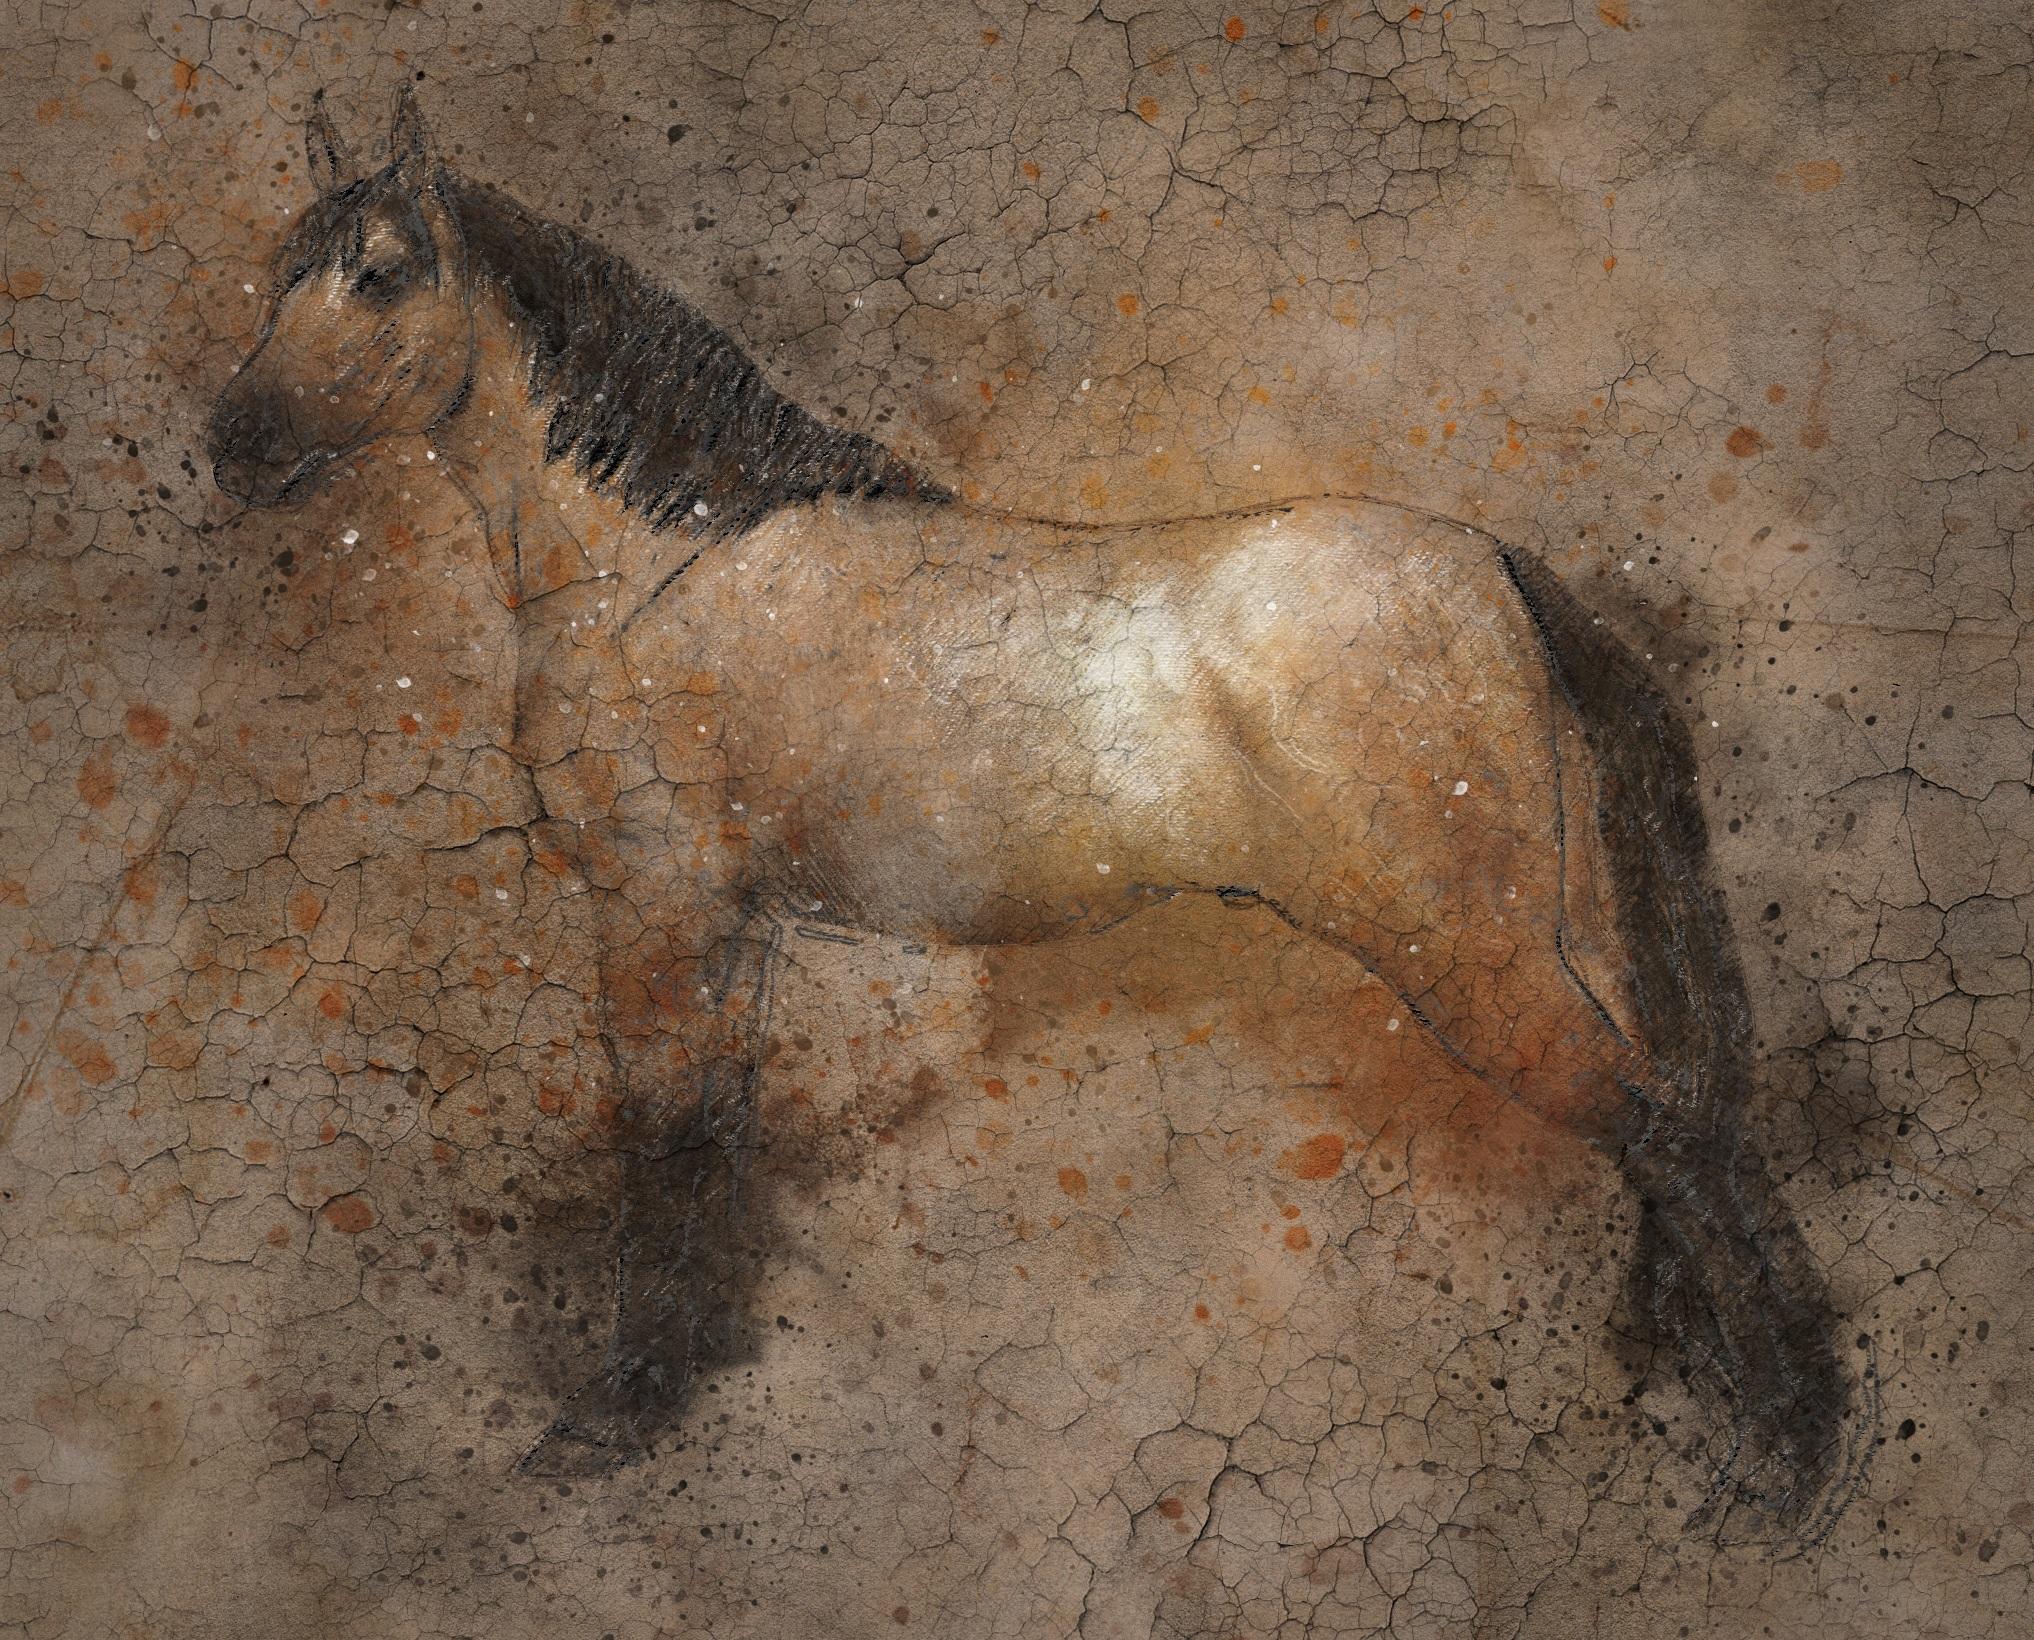 horse-2095404.jpg